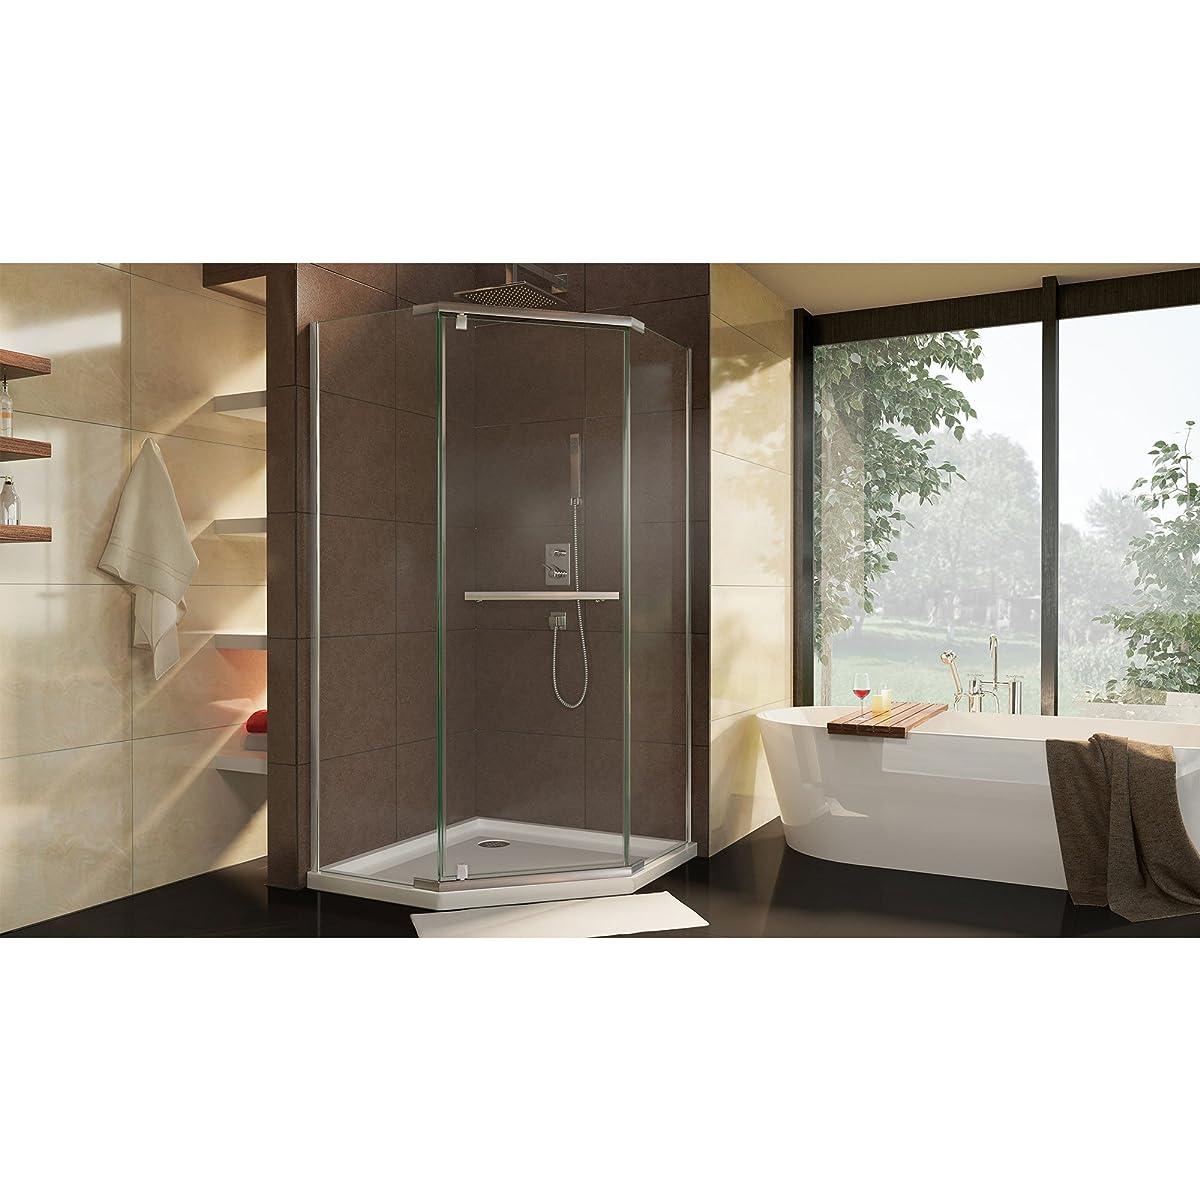 "DreamLine Prism 34 1/8 in. D x 34 1/8 in. W, Frameless Pivot Shower Enclosure, 3/8"" Glass, Brushed Nickel Finish"